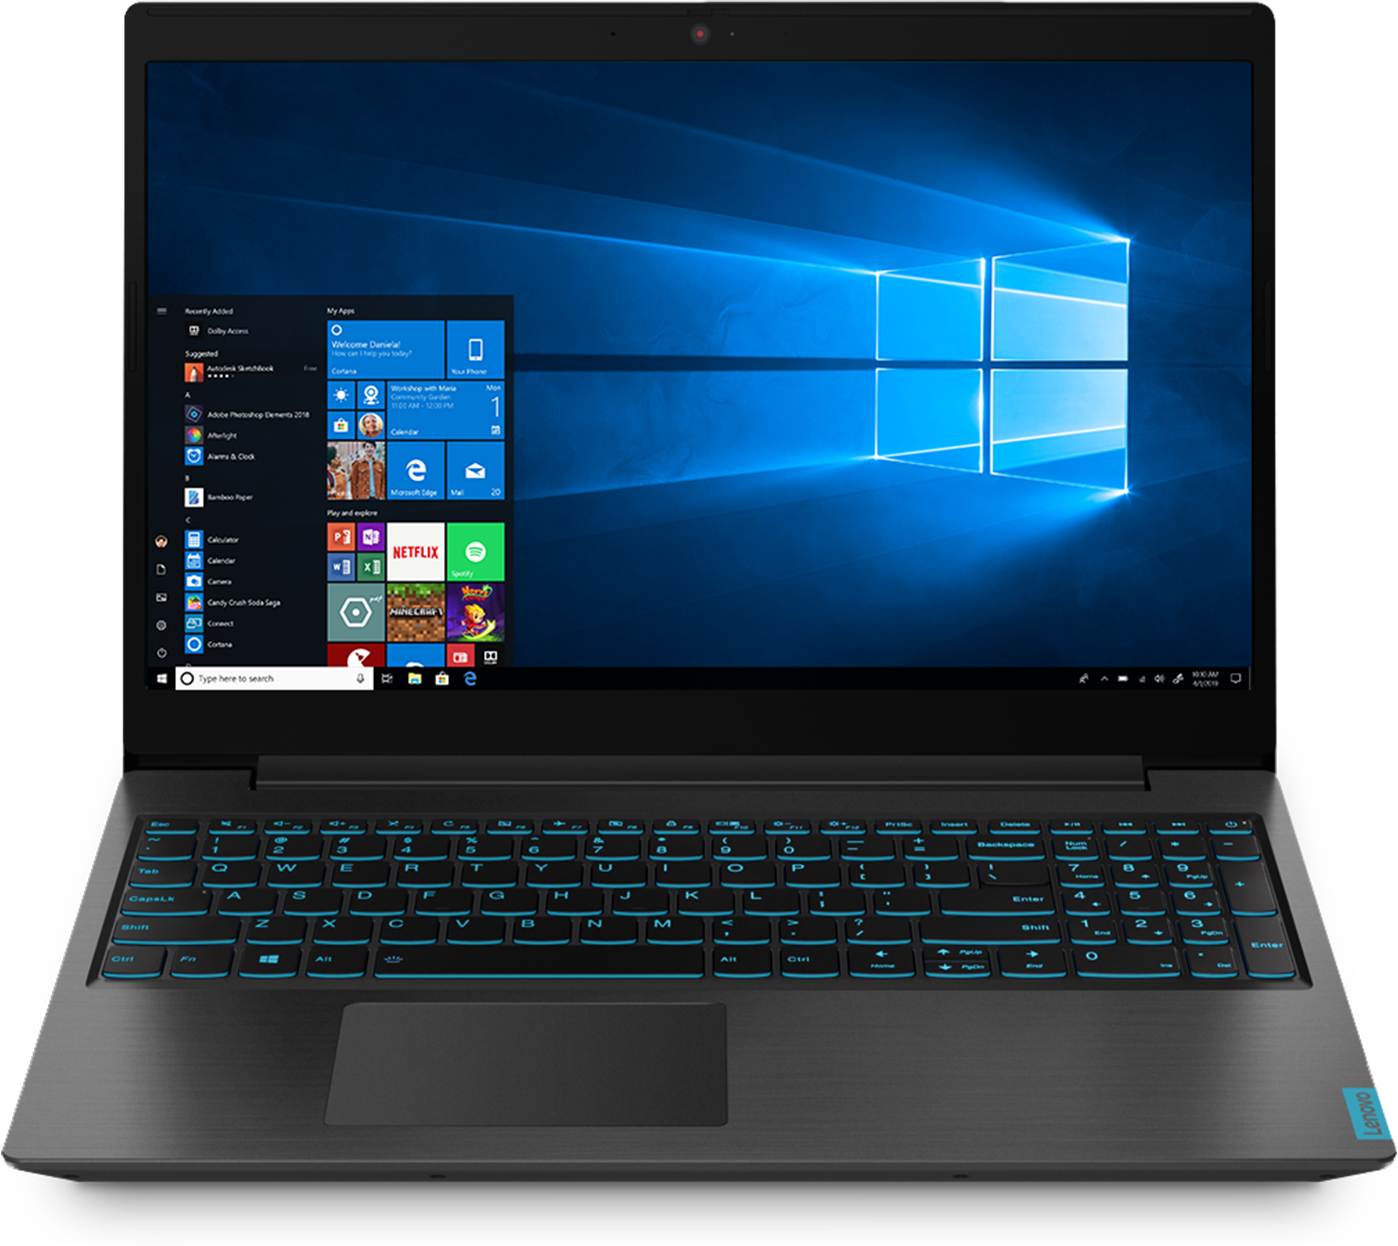 RE3gkdX?ver=8477 - Lenovo Ideapad L340 81LK000HUS Gaming Laptop